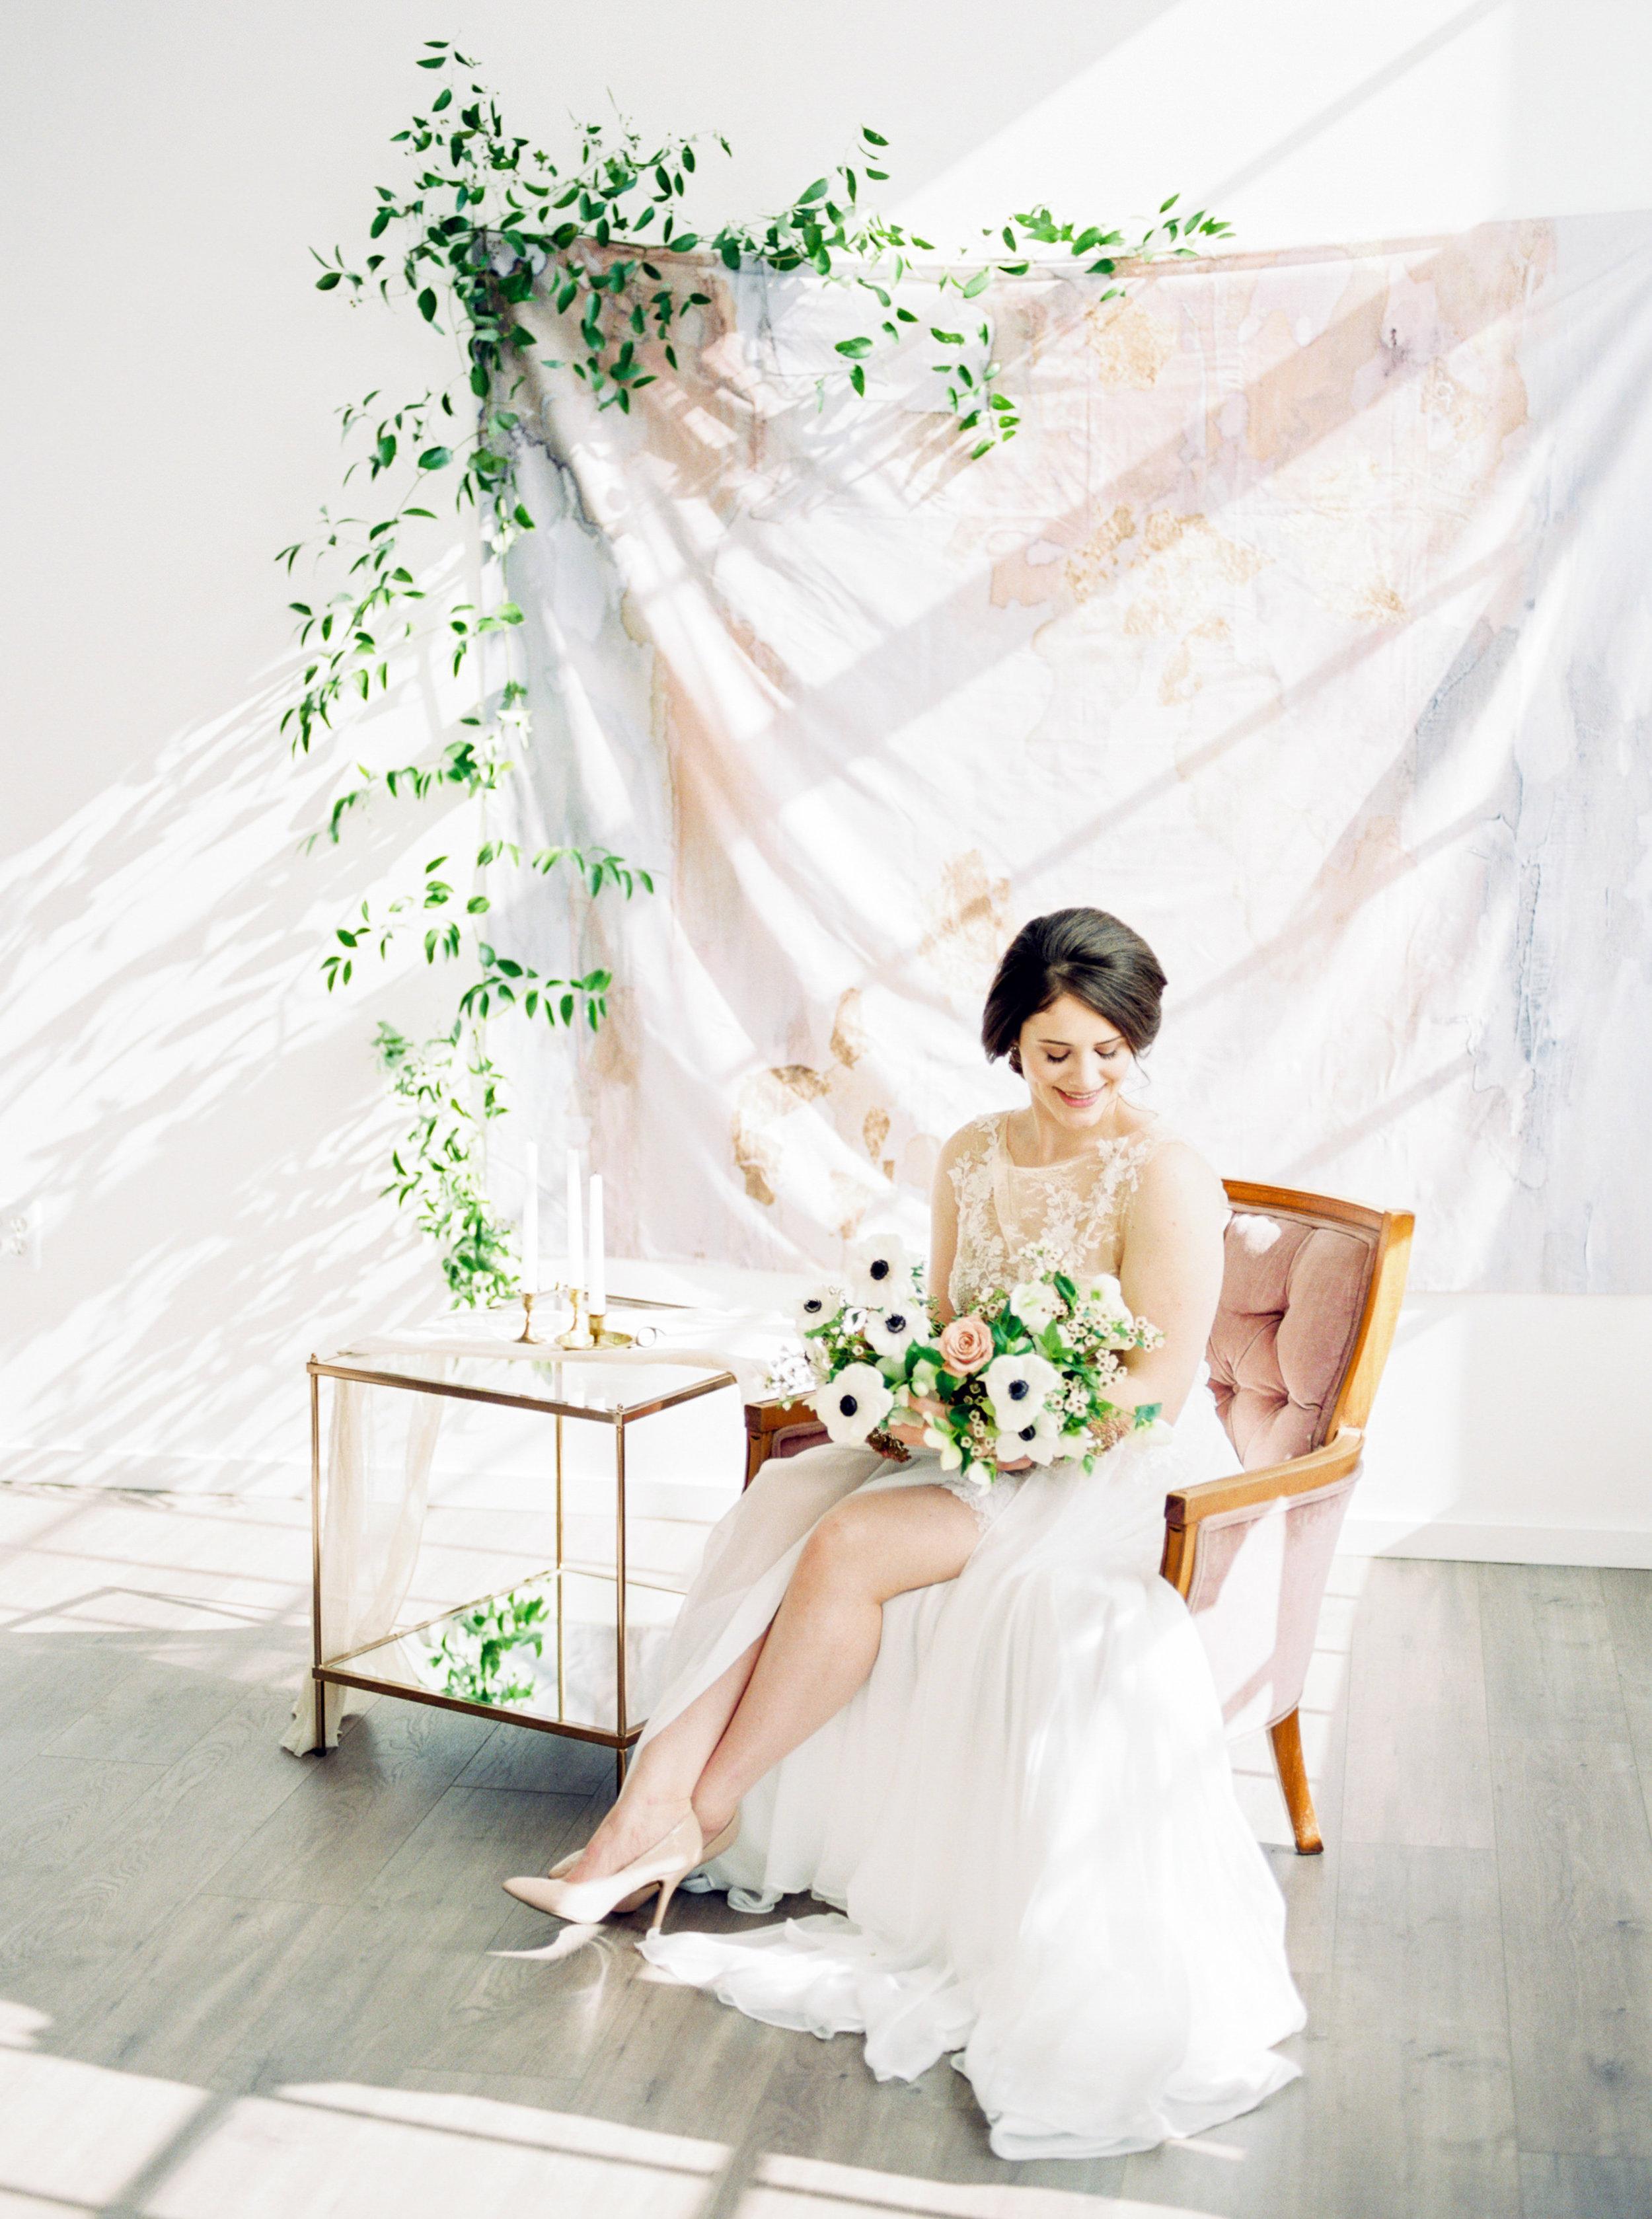 Fine_Art_Minimal_Bride_Georgia_Ruth_Photography-10.jpg